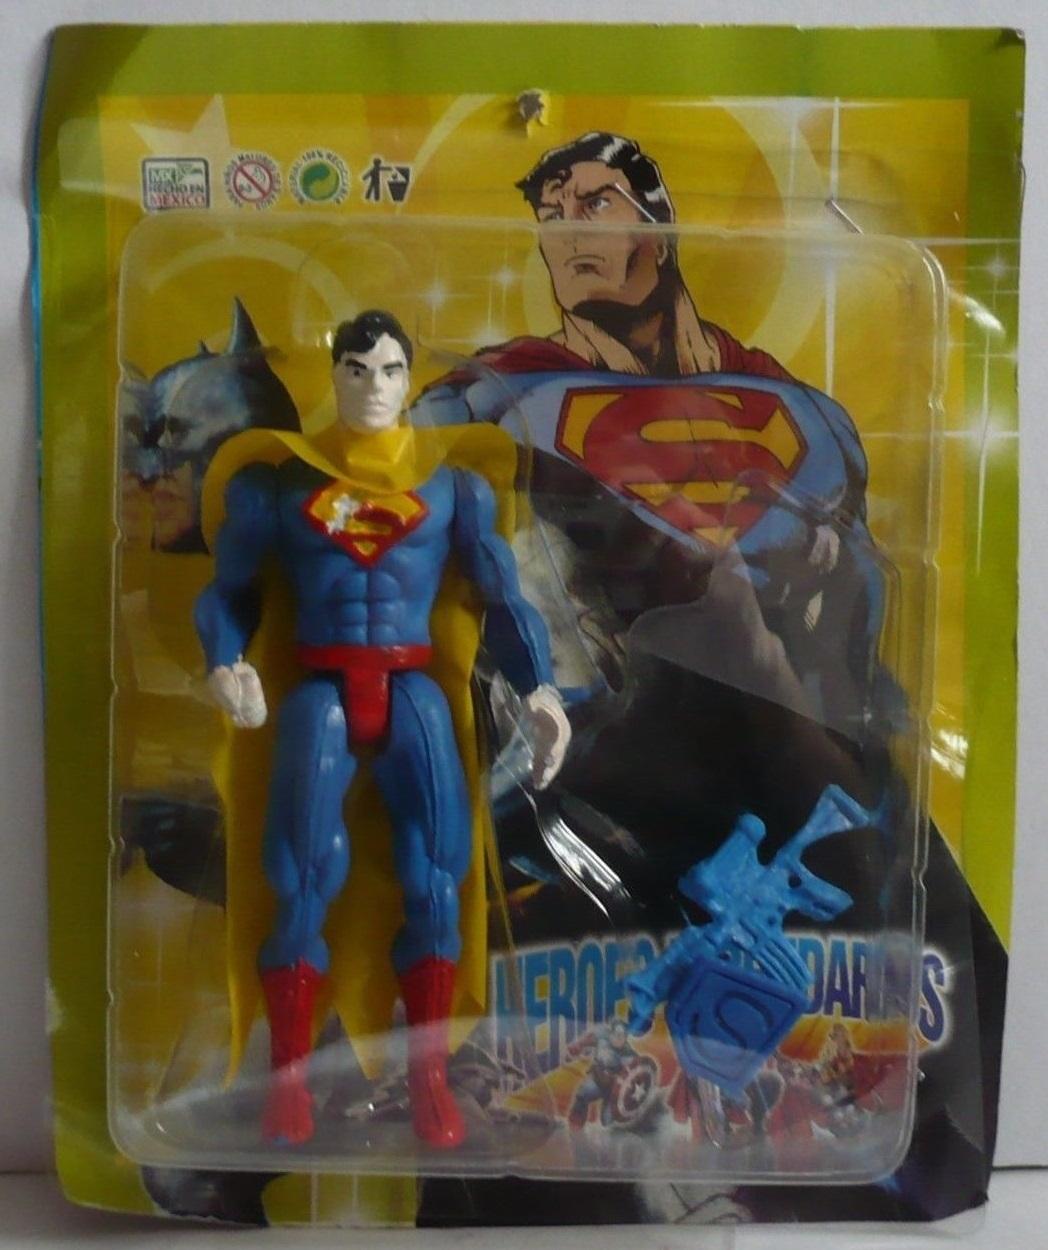 Superman (Legendary Heroes figure)